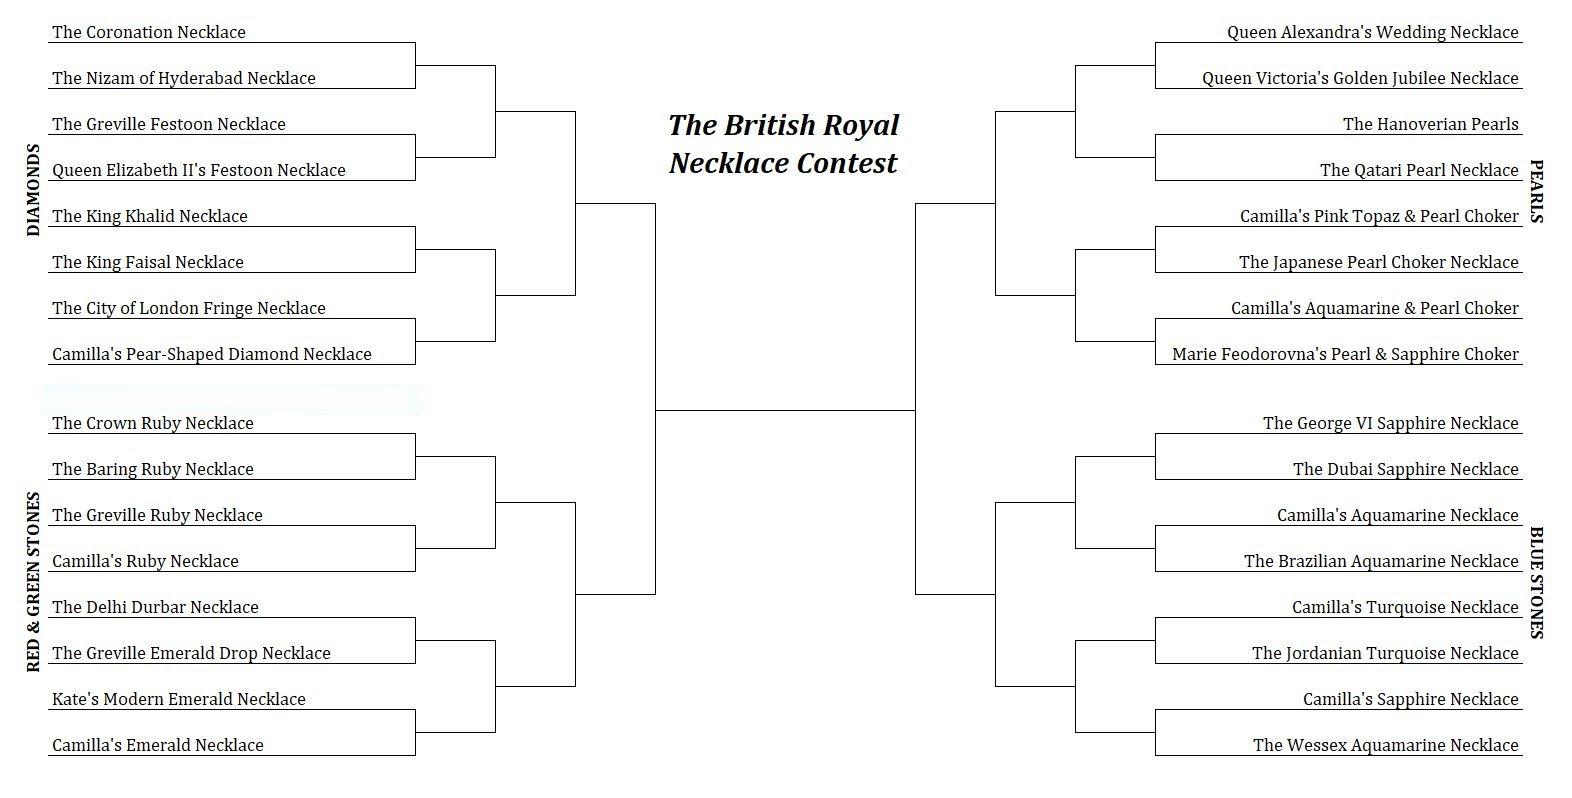 The British Royal Necklace Contest Bracket